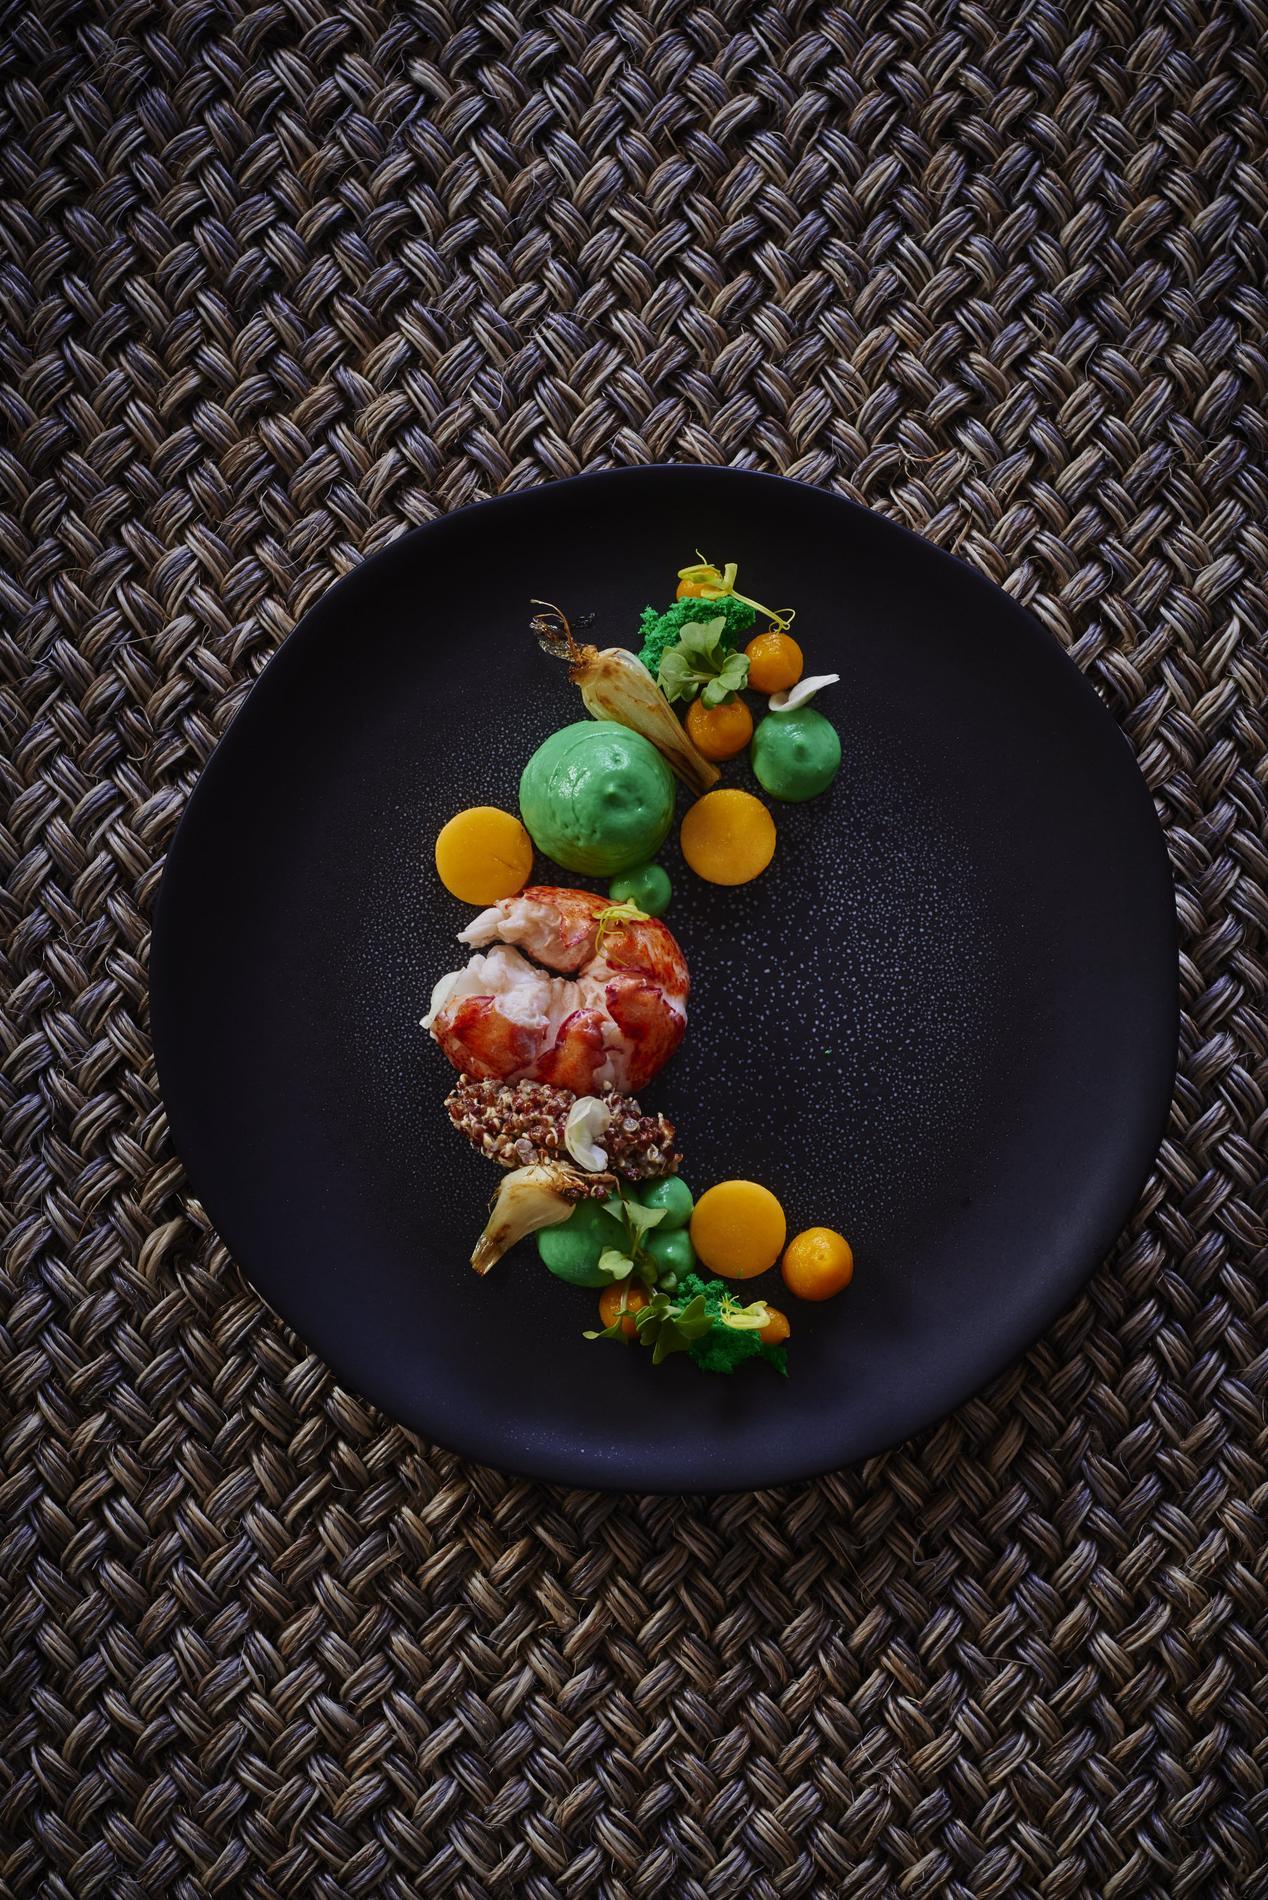 Recette homard au quinoa et avocat cuisine madame figaro - Accompagnement homard grille ...